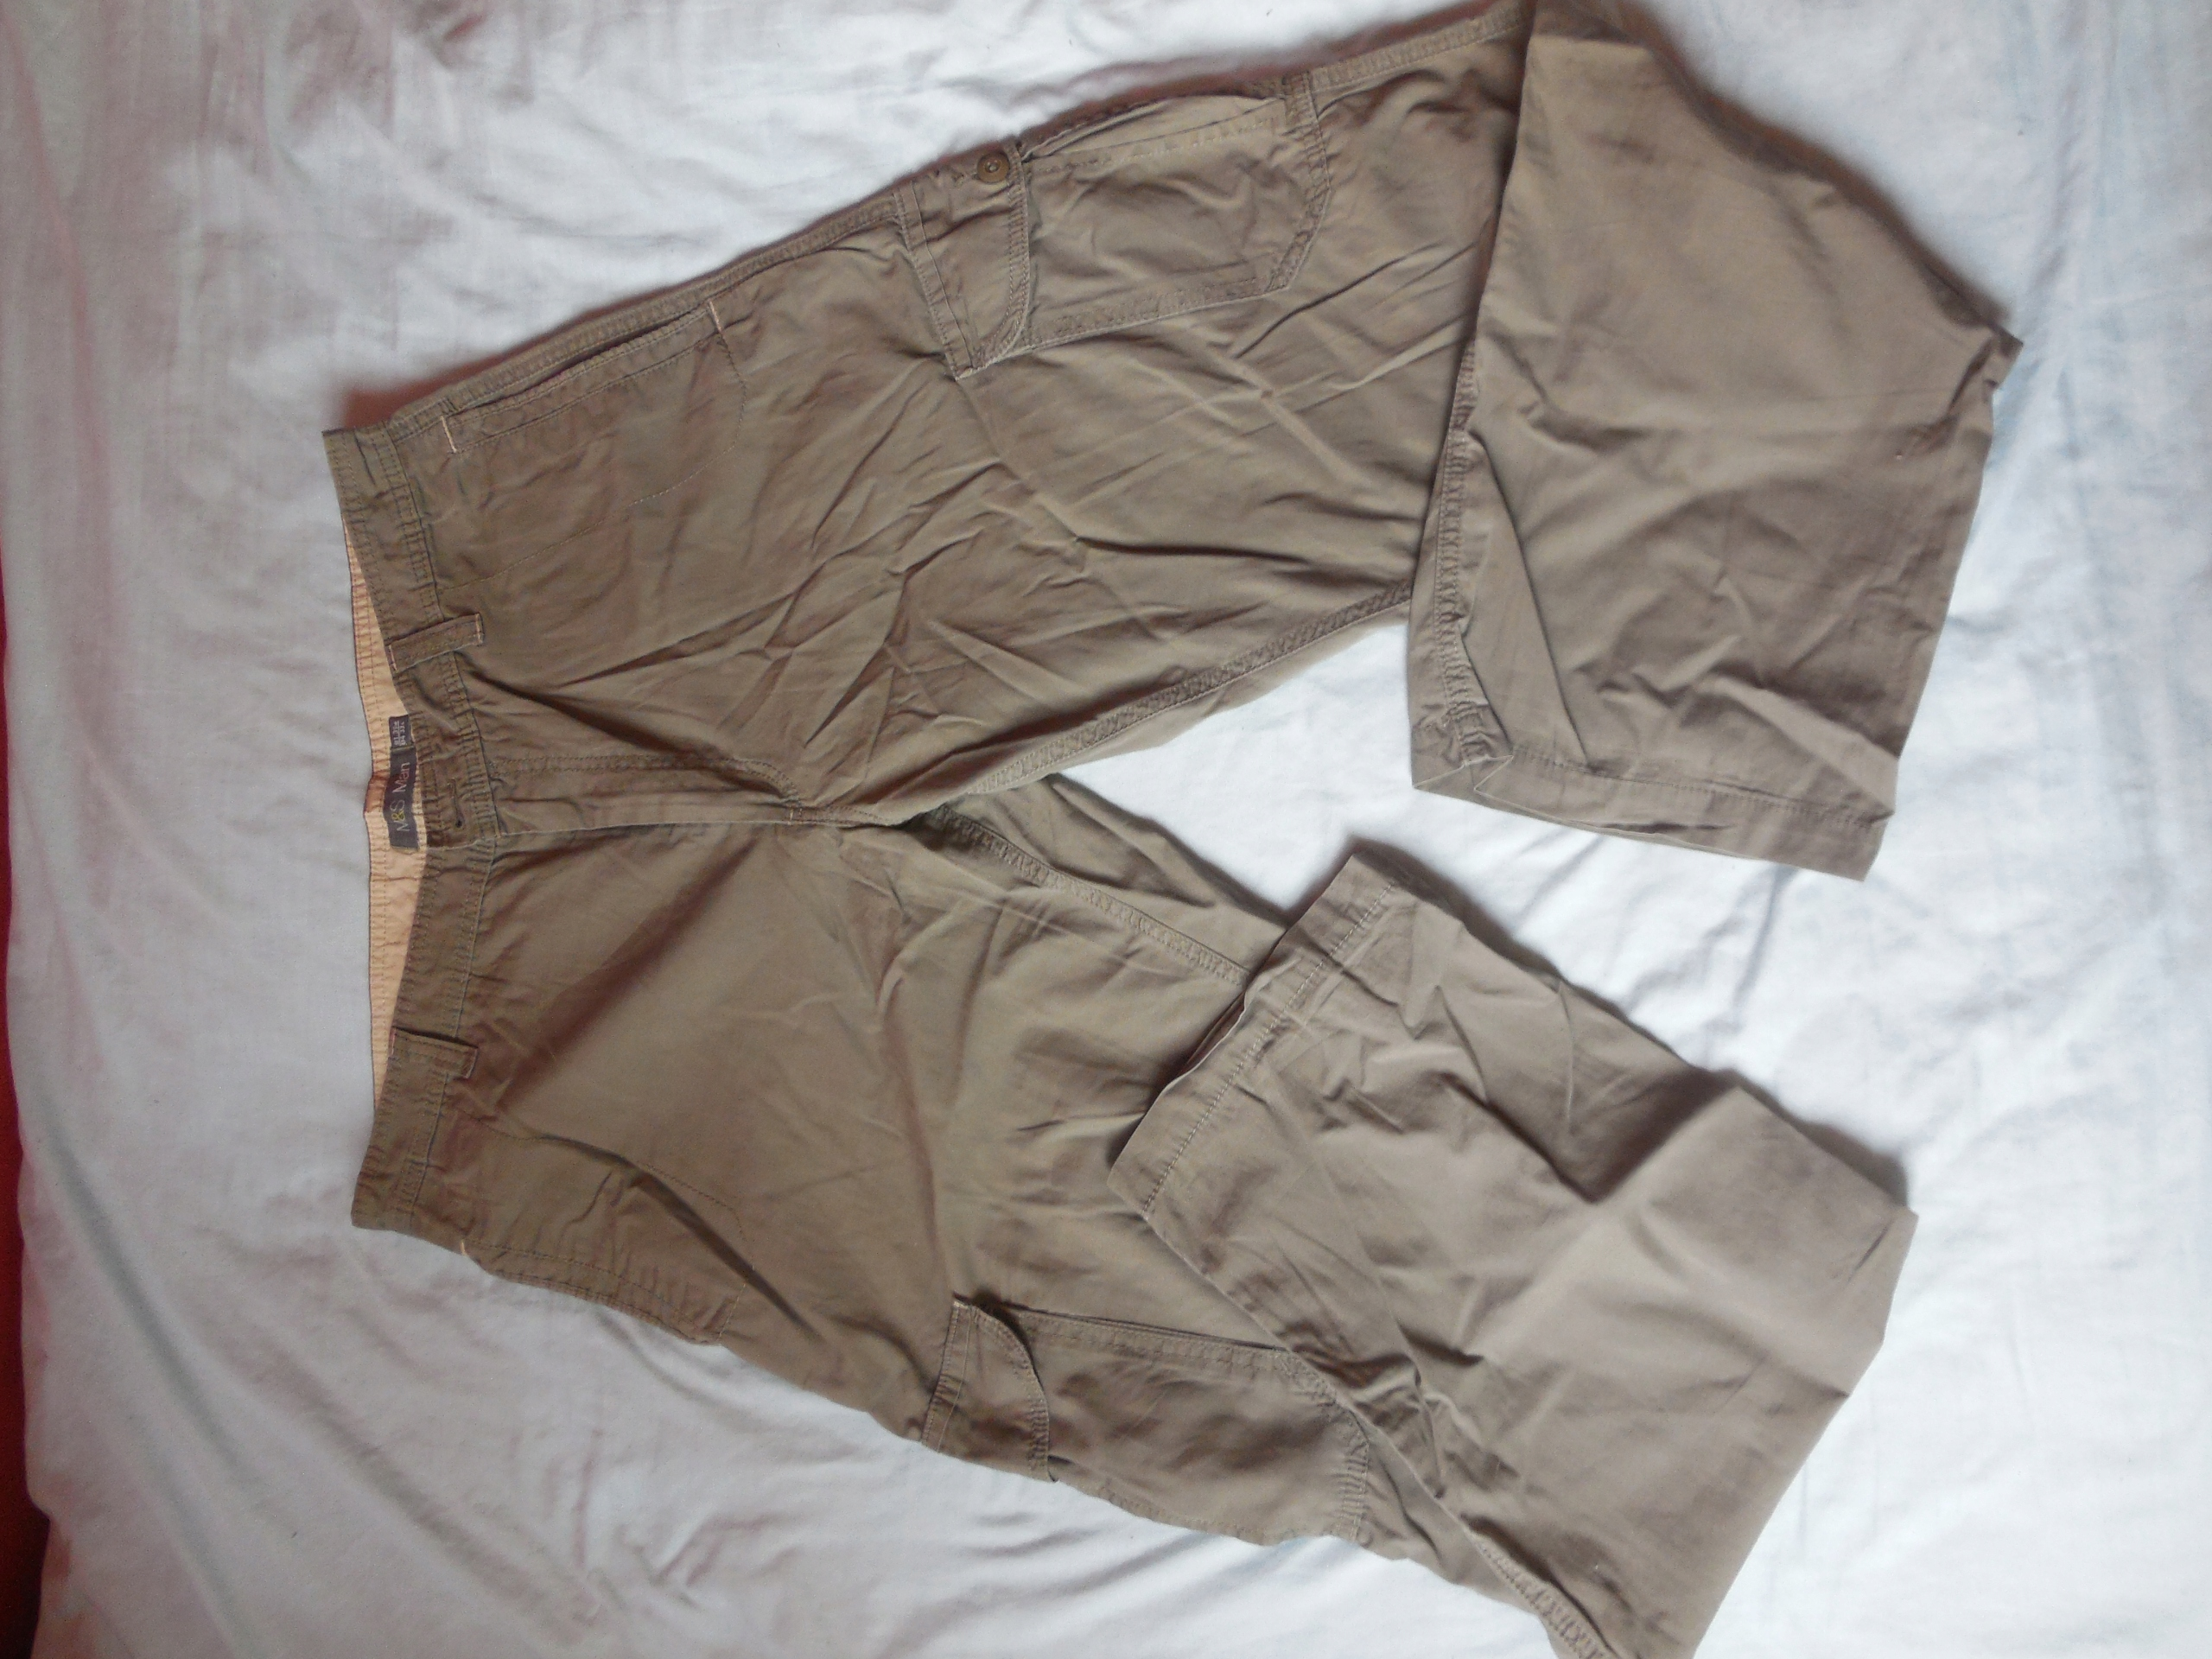 MARKS&SPENCER Spodnie bojówki męskie, rozm. L